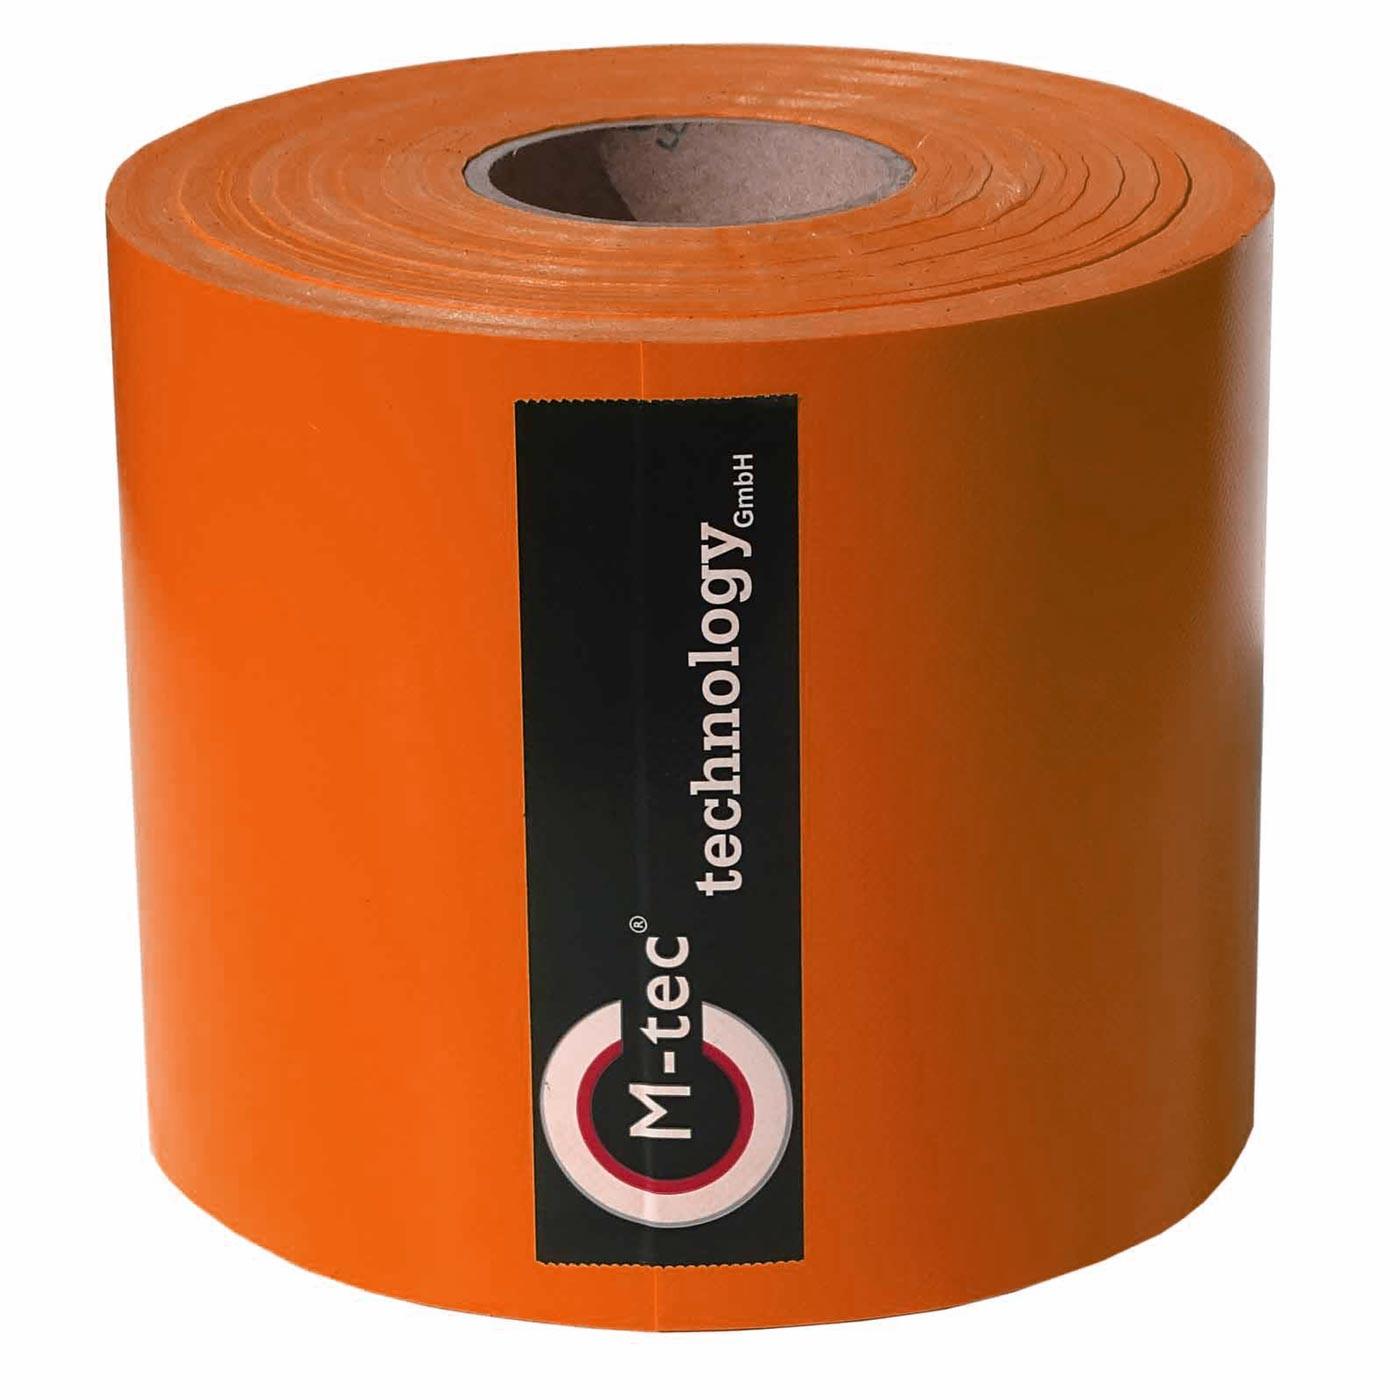 M-tec Profi-line ®  Sichtschutz orange